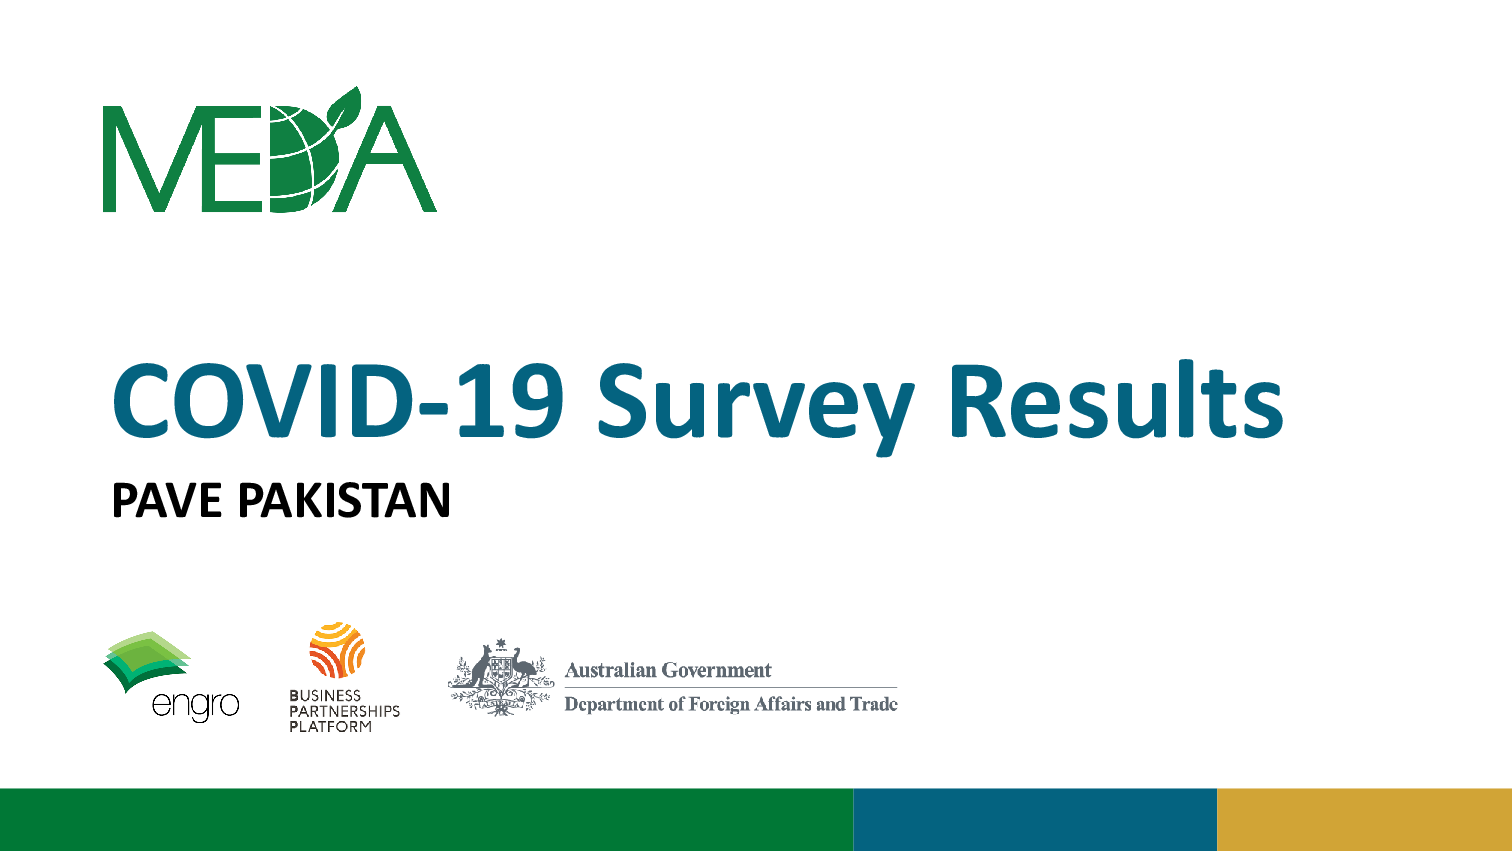 PAVE COVID-19 Survey Results